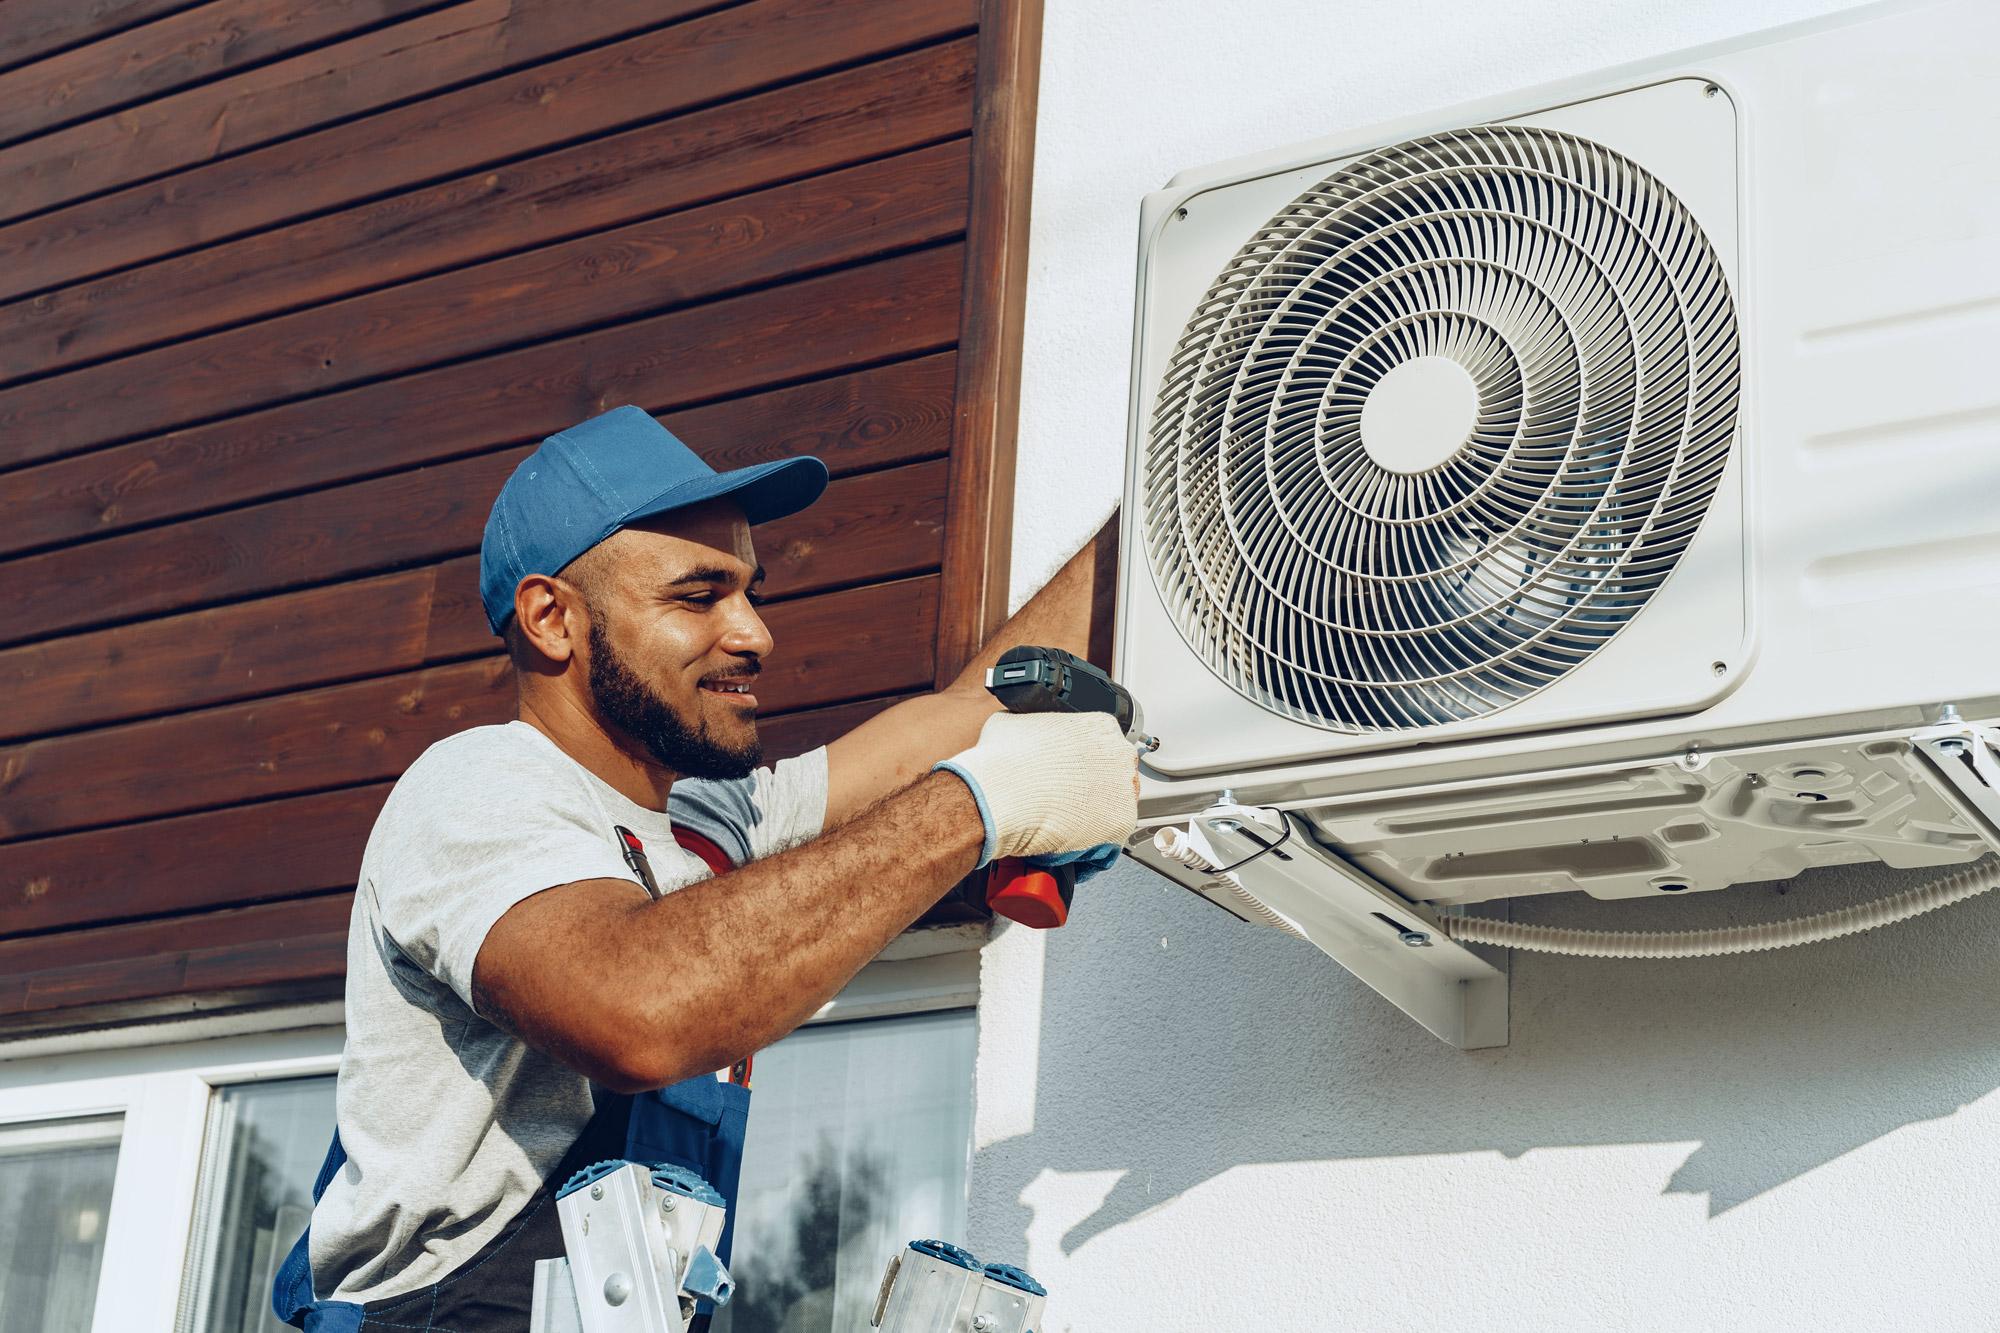 HVAC Technician Repairing HVAC unit outside